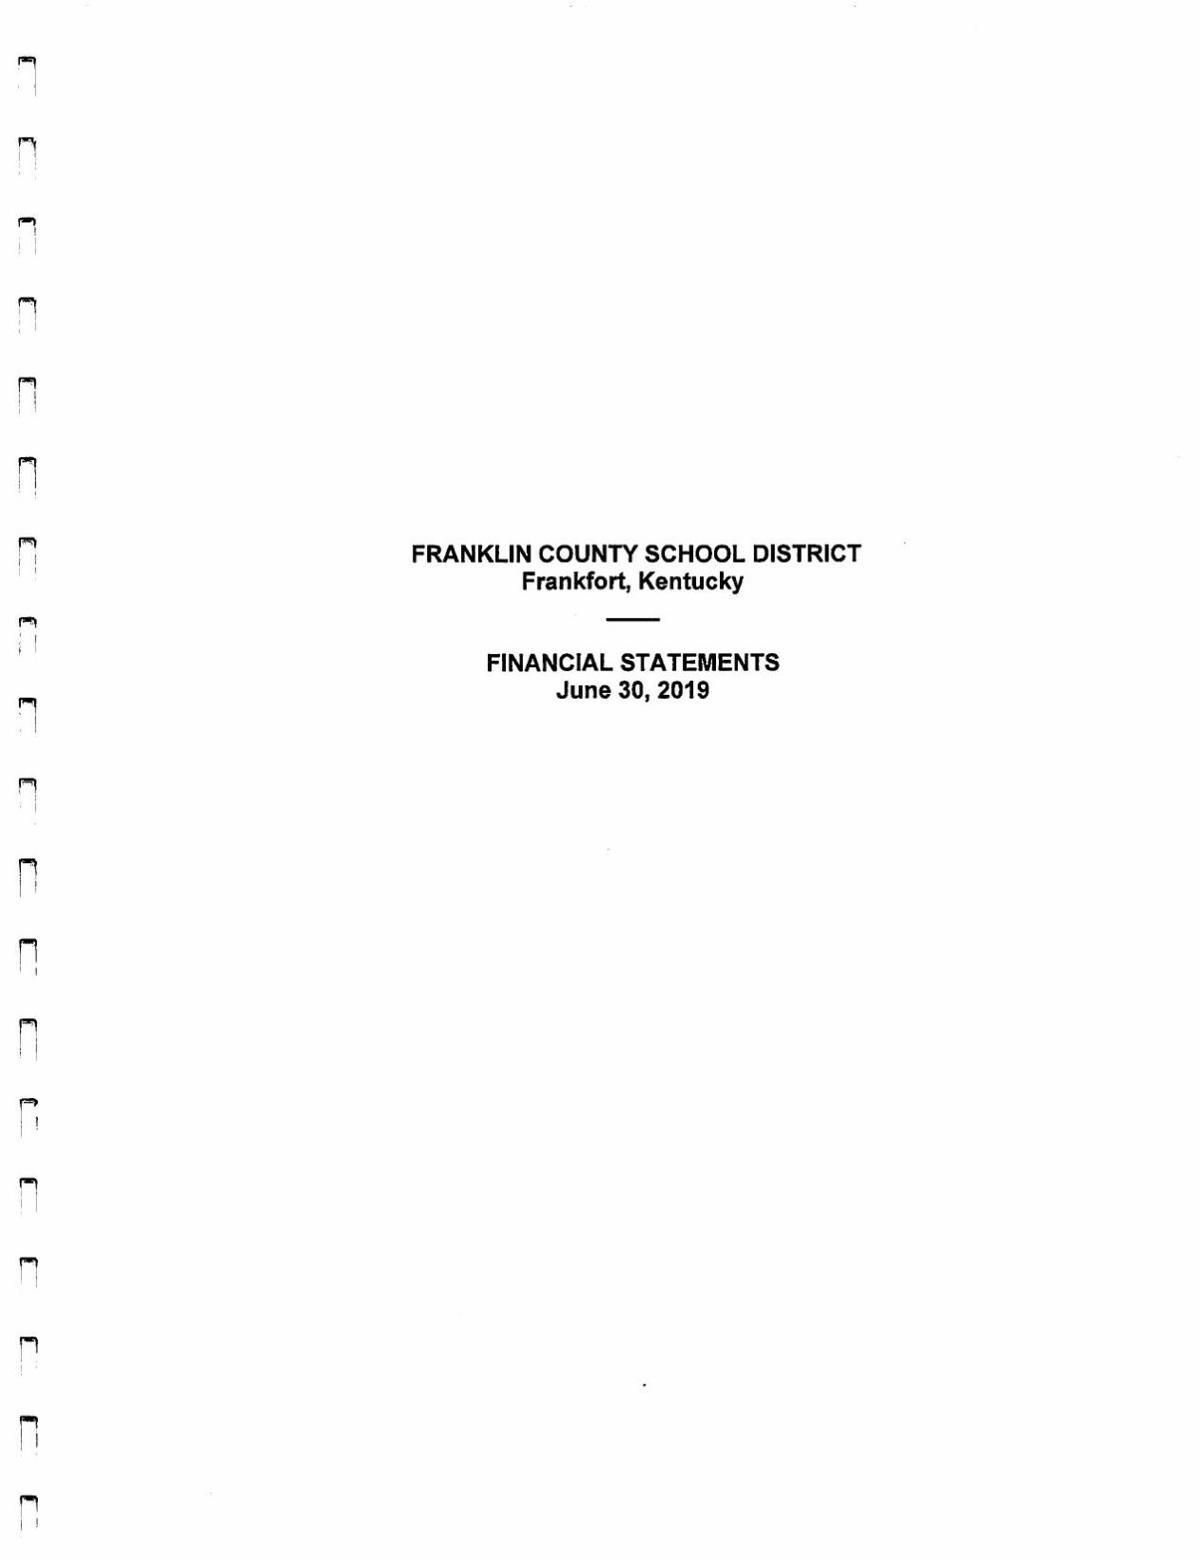 Franklin County Schools 2019 Financial Statements